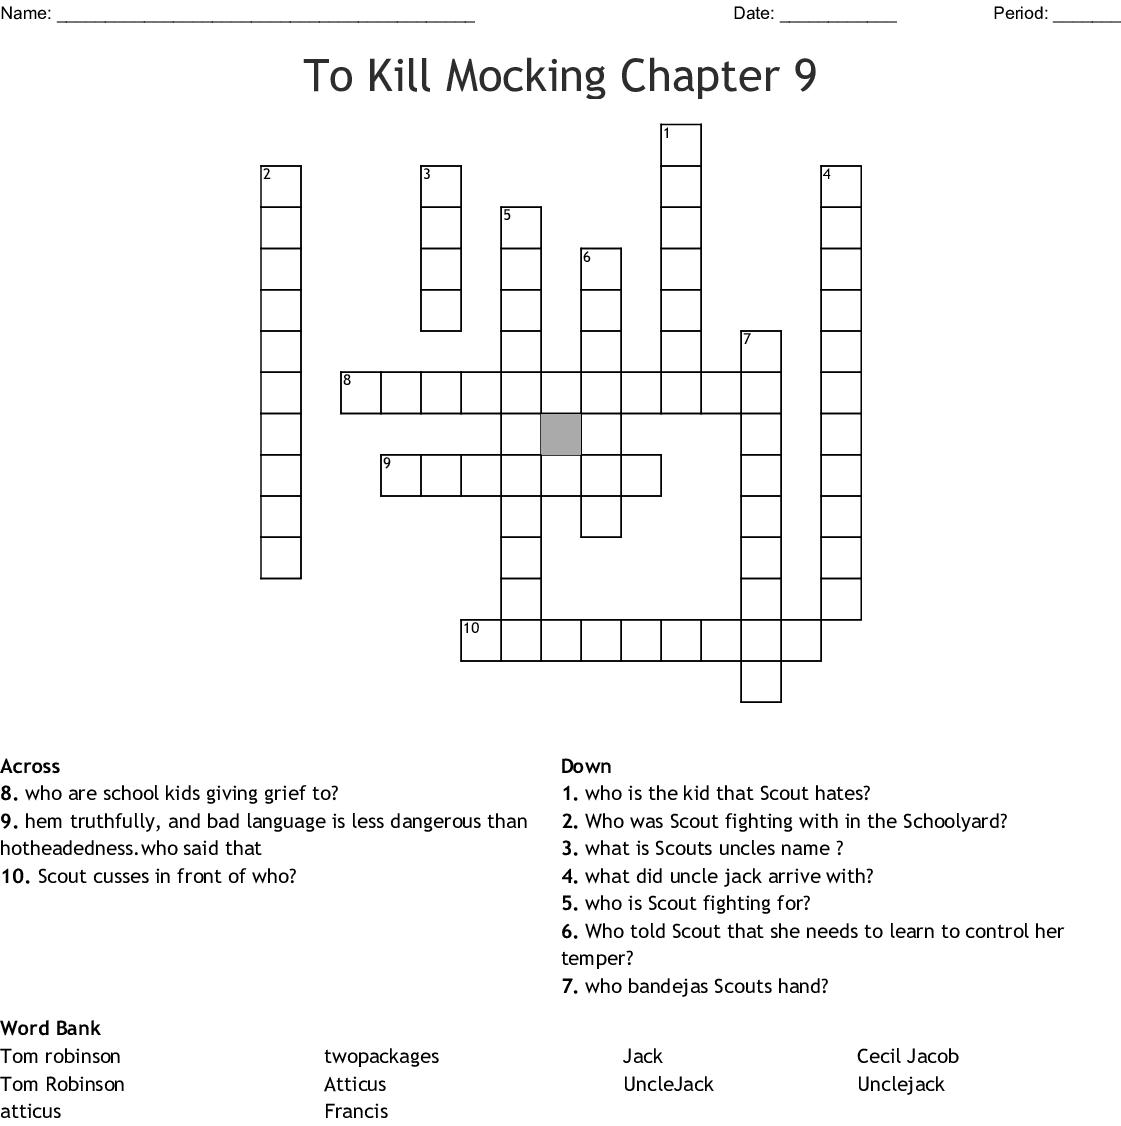 To Kill Mocking Chapter 9 Crossword